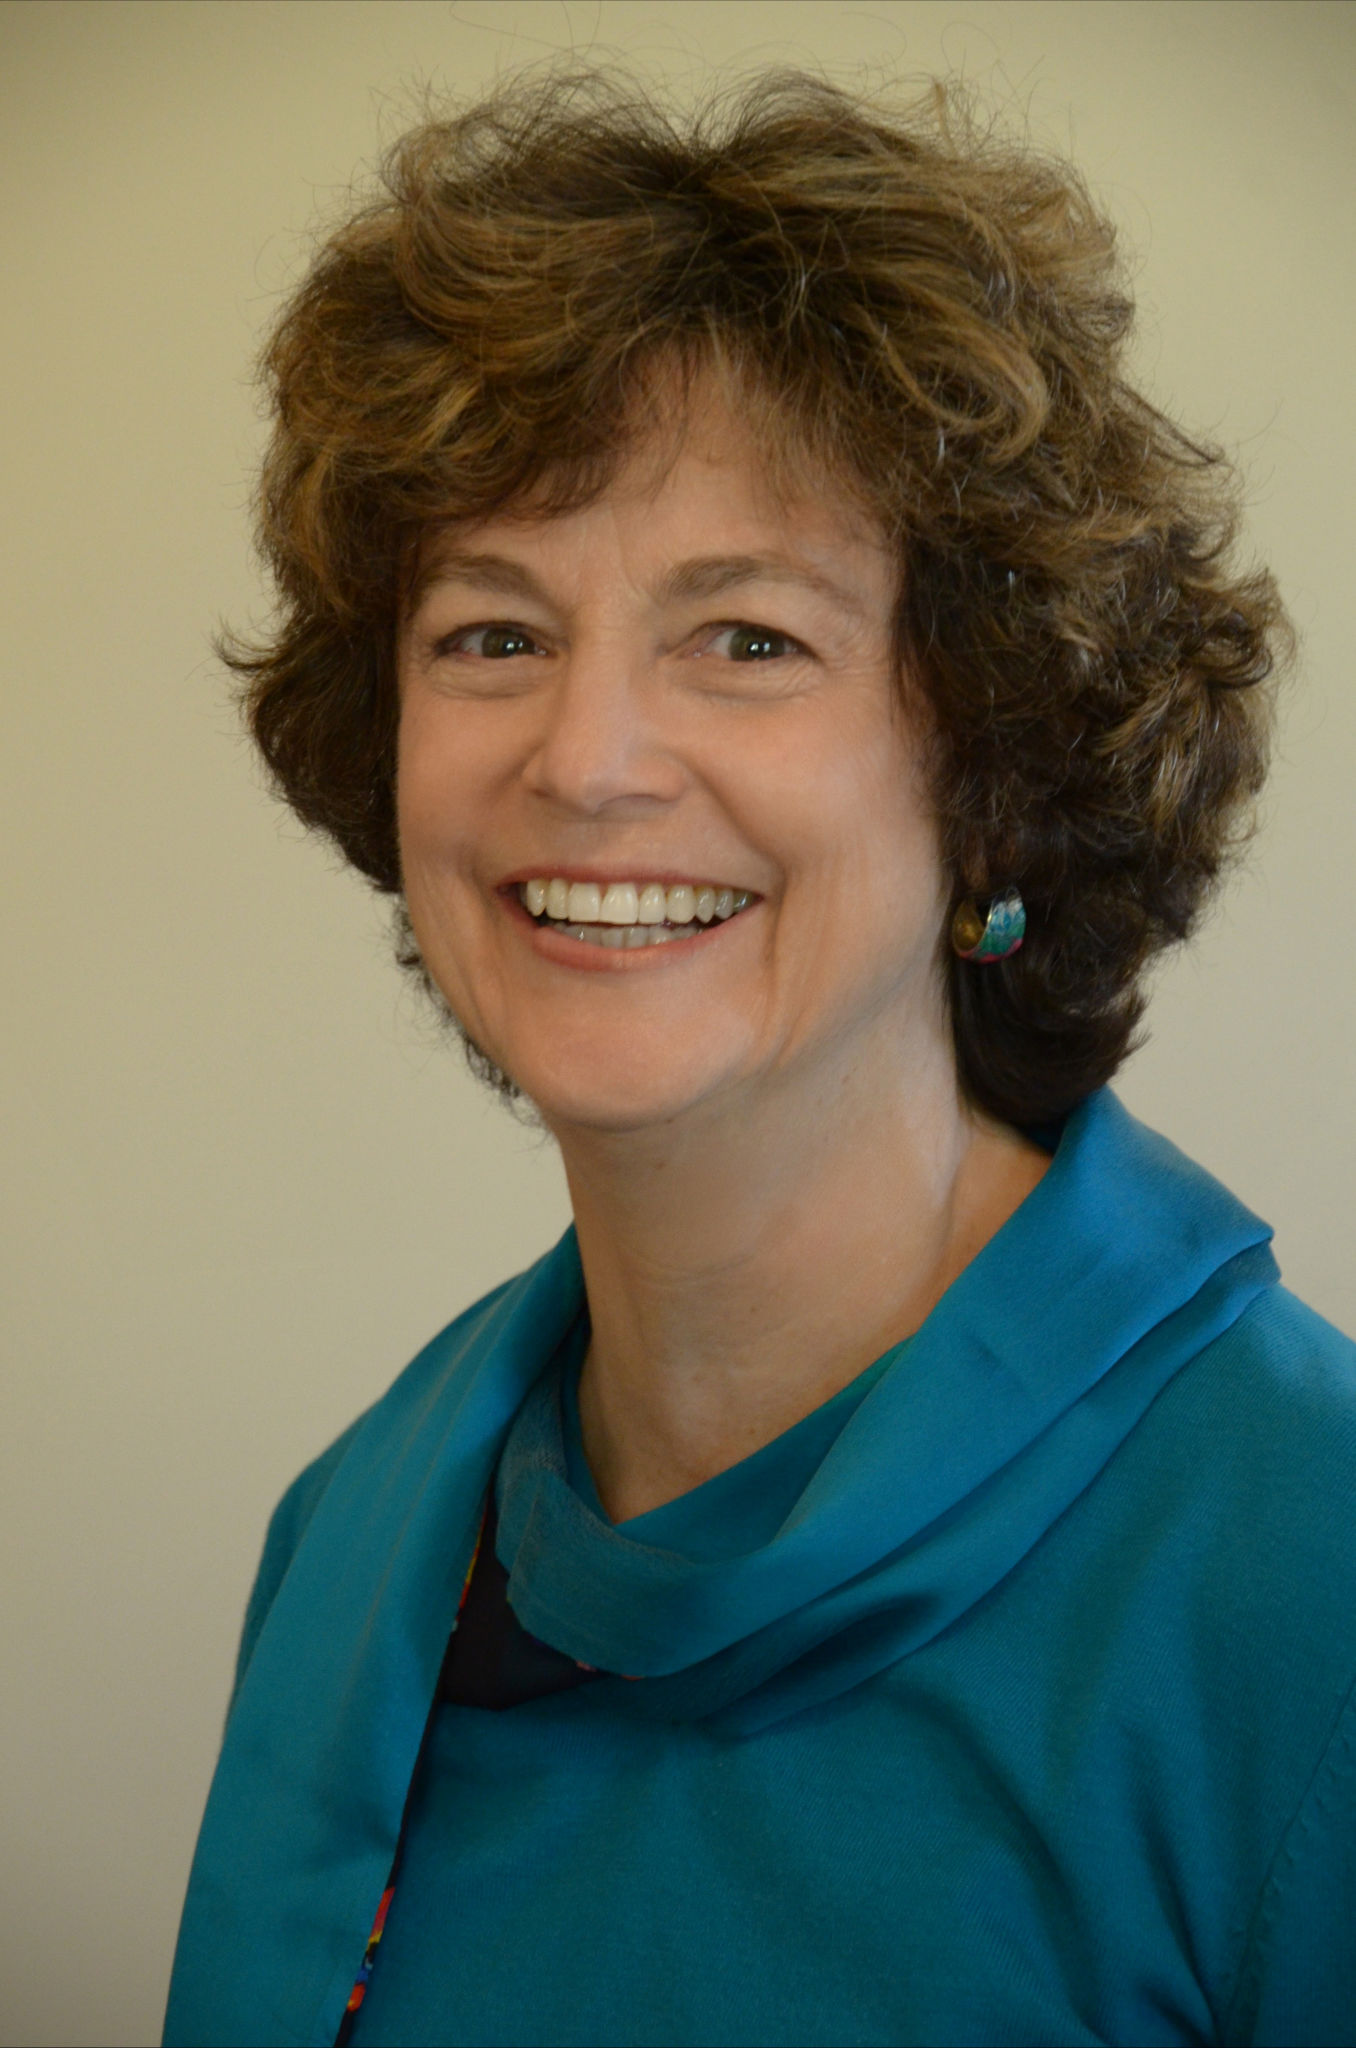 Kathy Tyers Gillin